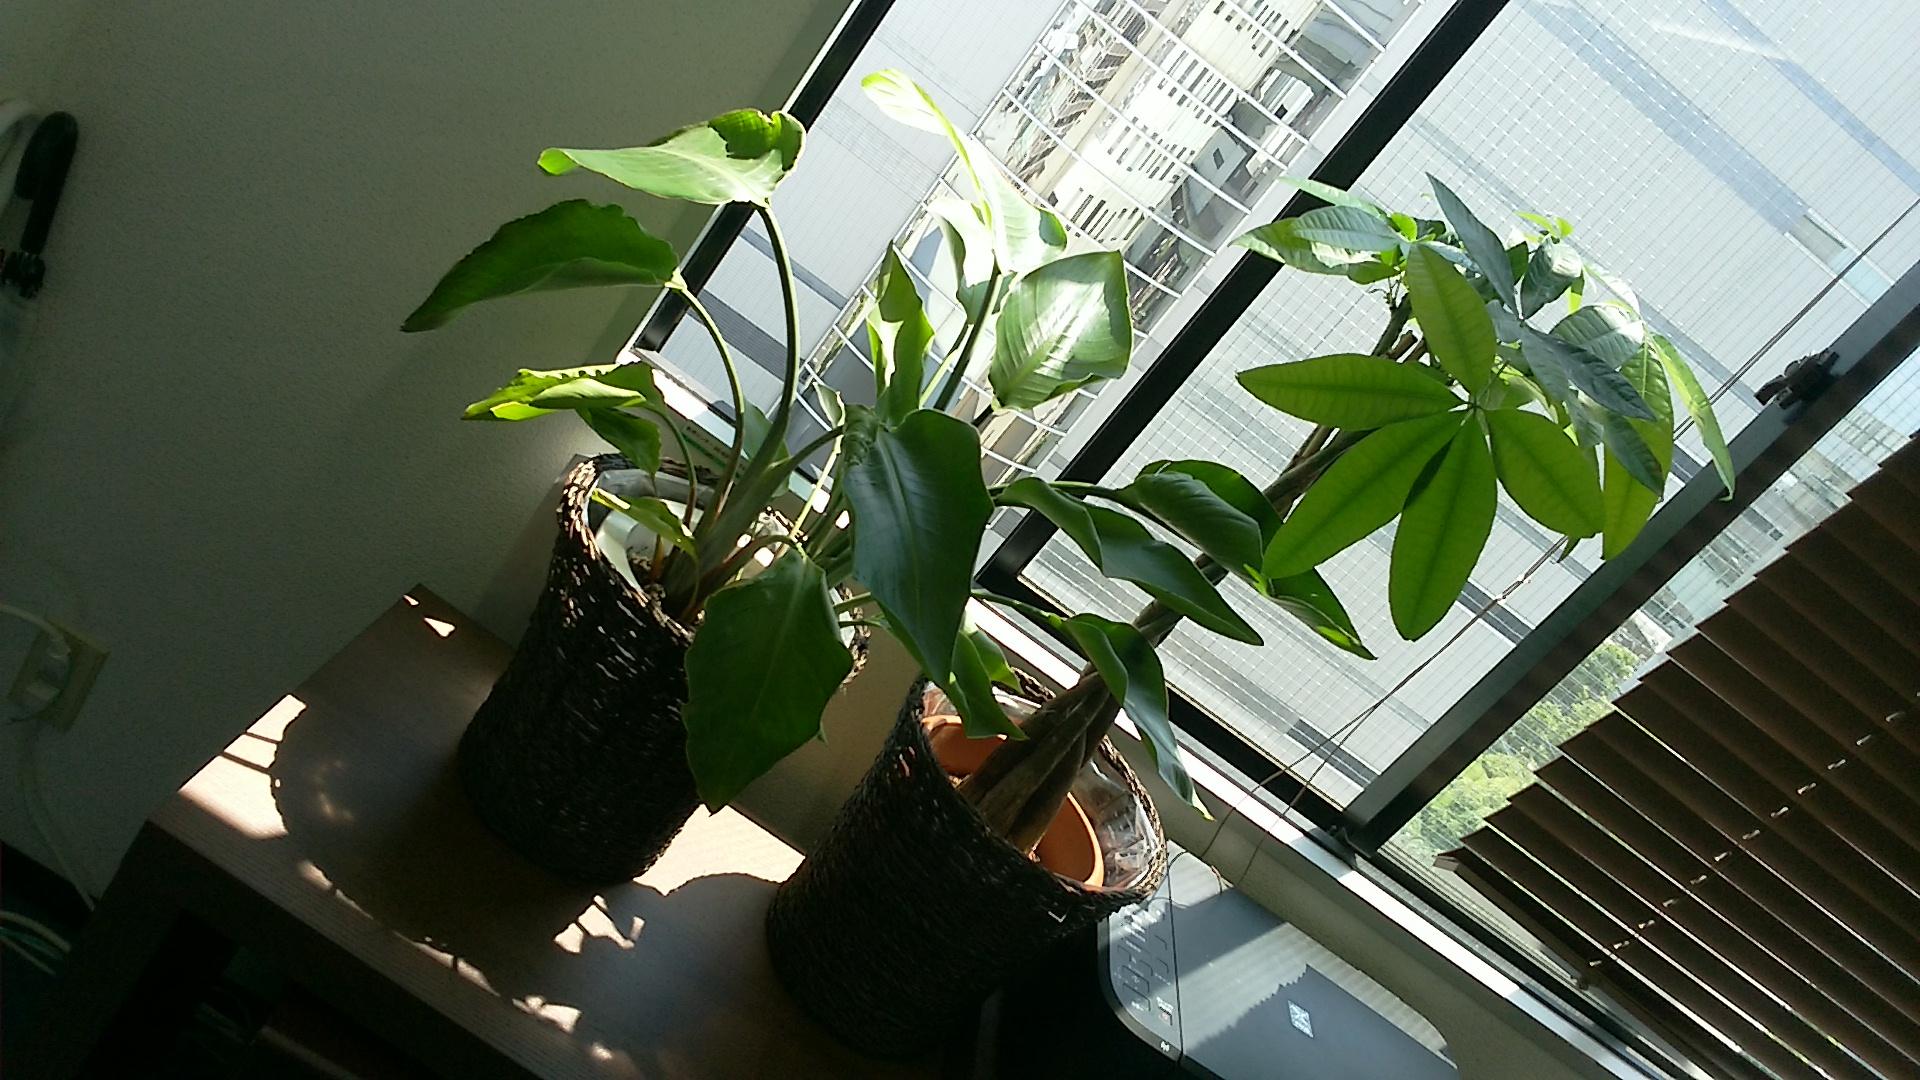 東大阪の事務所の観葉植物。日光浴中